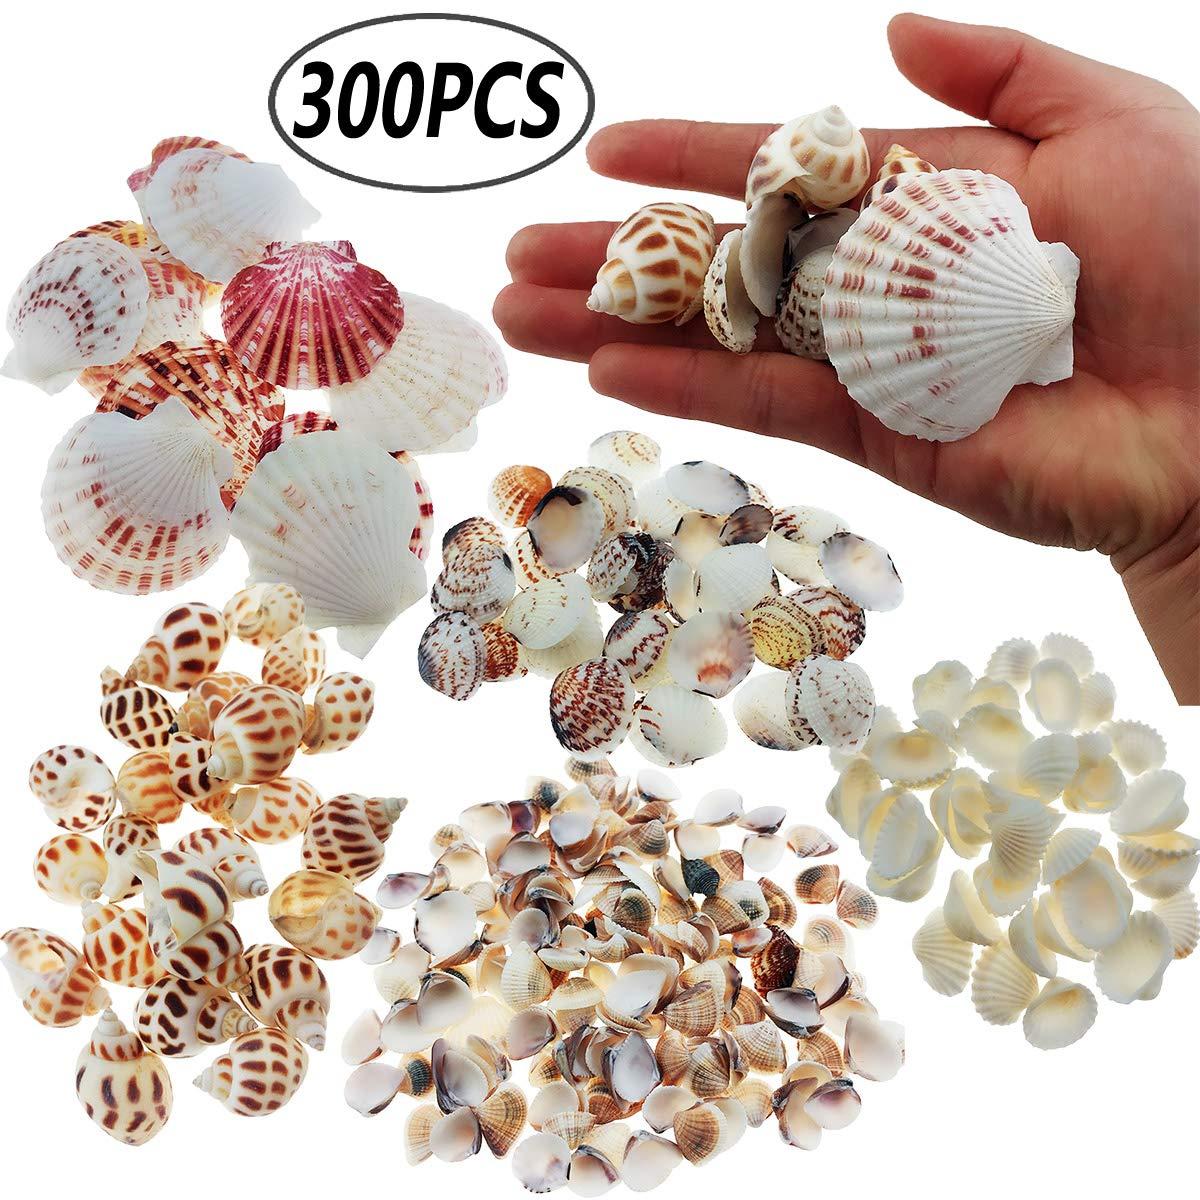 Wankko 300pcs Sea Shells Mixed Ocean Beach Seashells, Various Sizes Natural Seashells for Fish Tank, Home Decorations, Beach Theme Party, Candle Making, Wedding Decor, DIY Crafts, Fish Tan